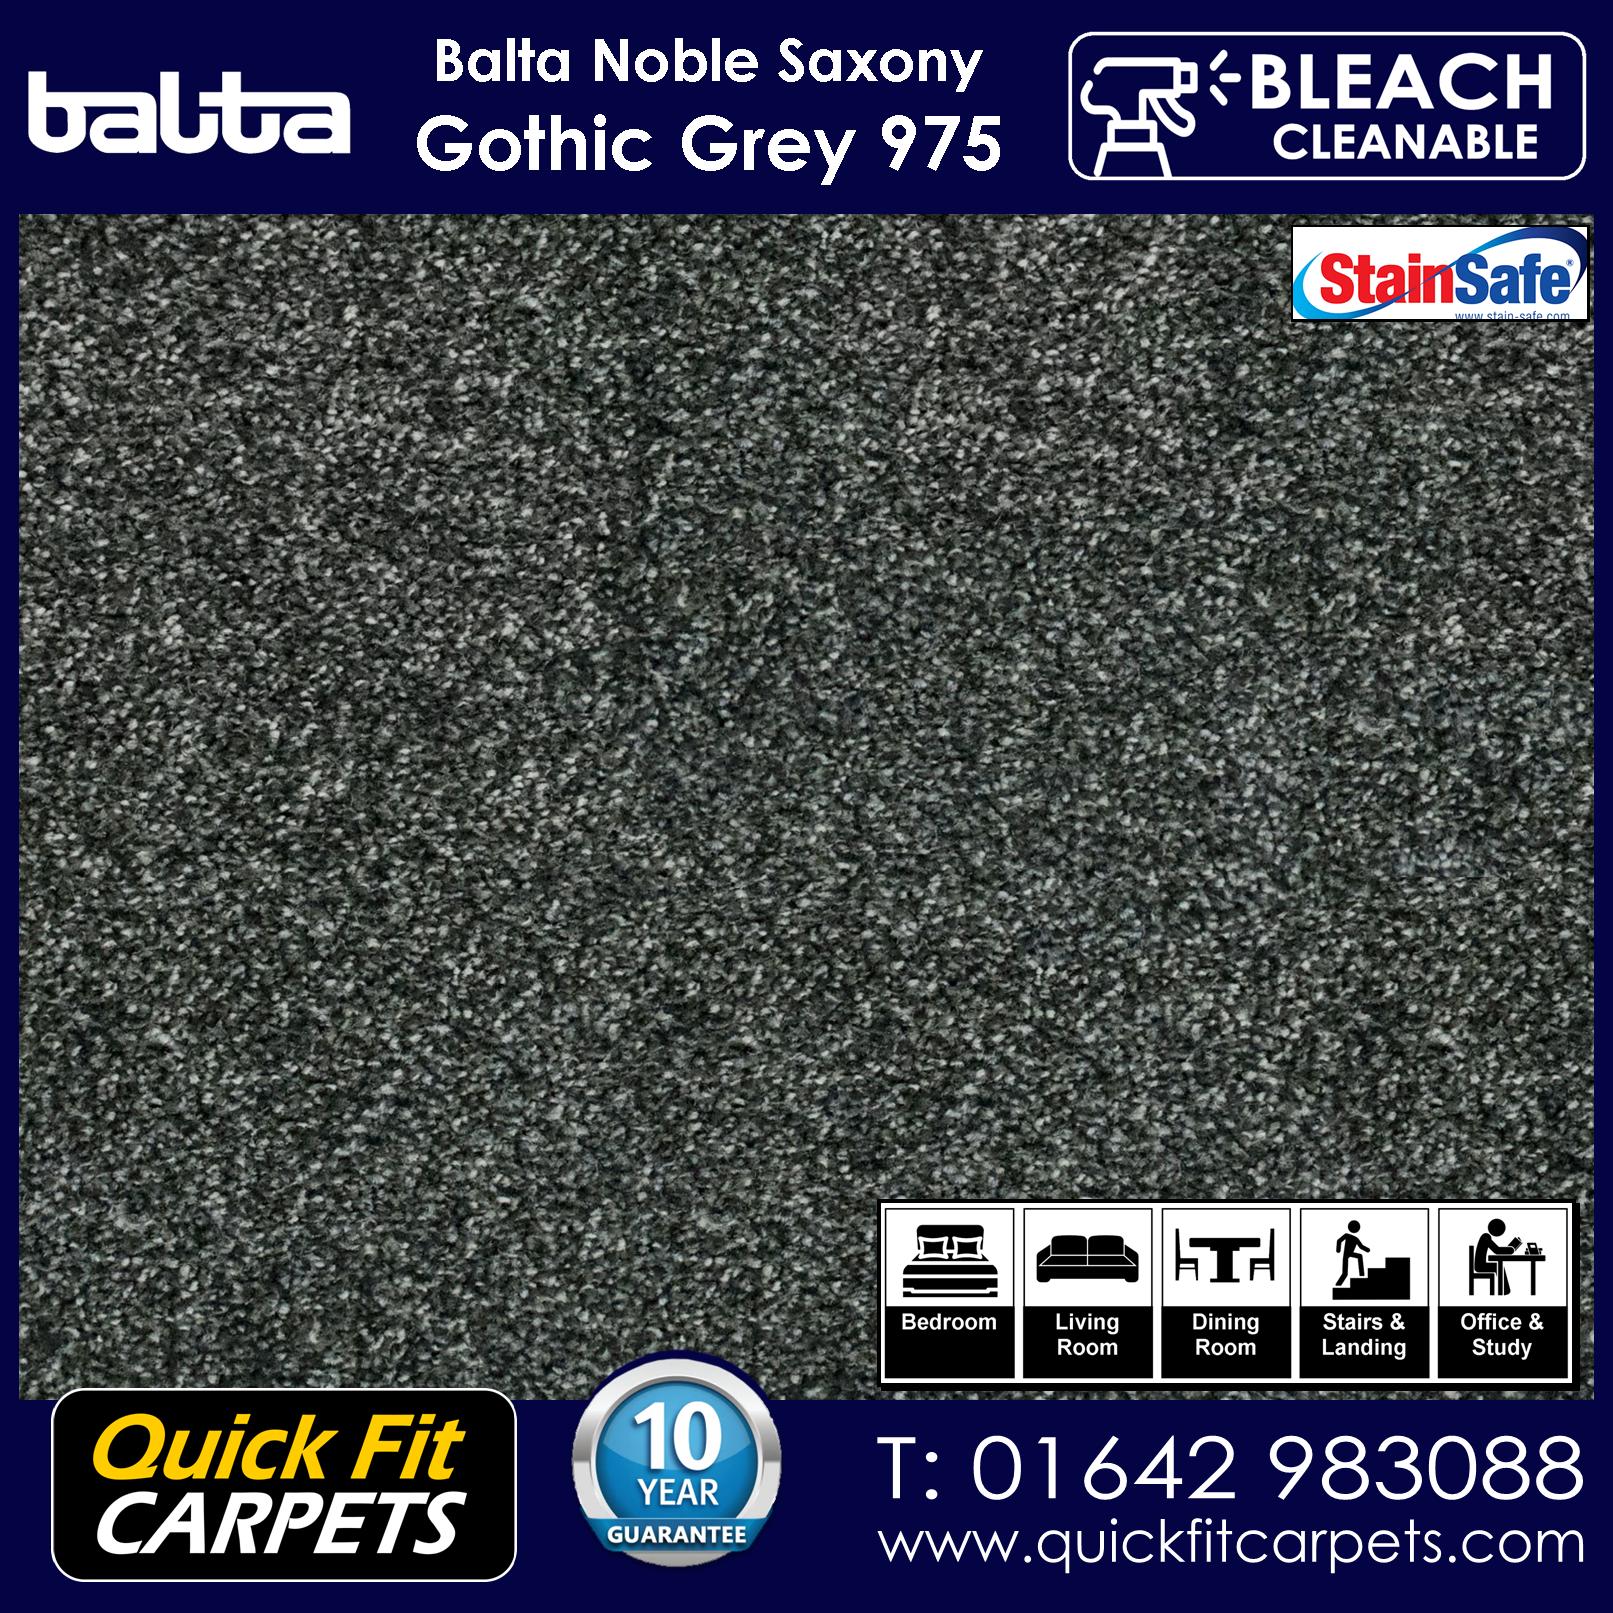 Quick Fit Carpets Balta Luxury Pile Gothic Grey 975